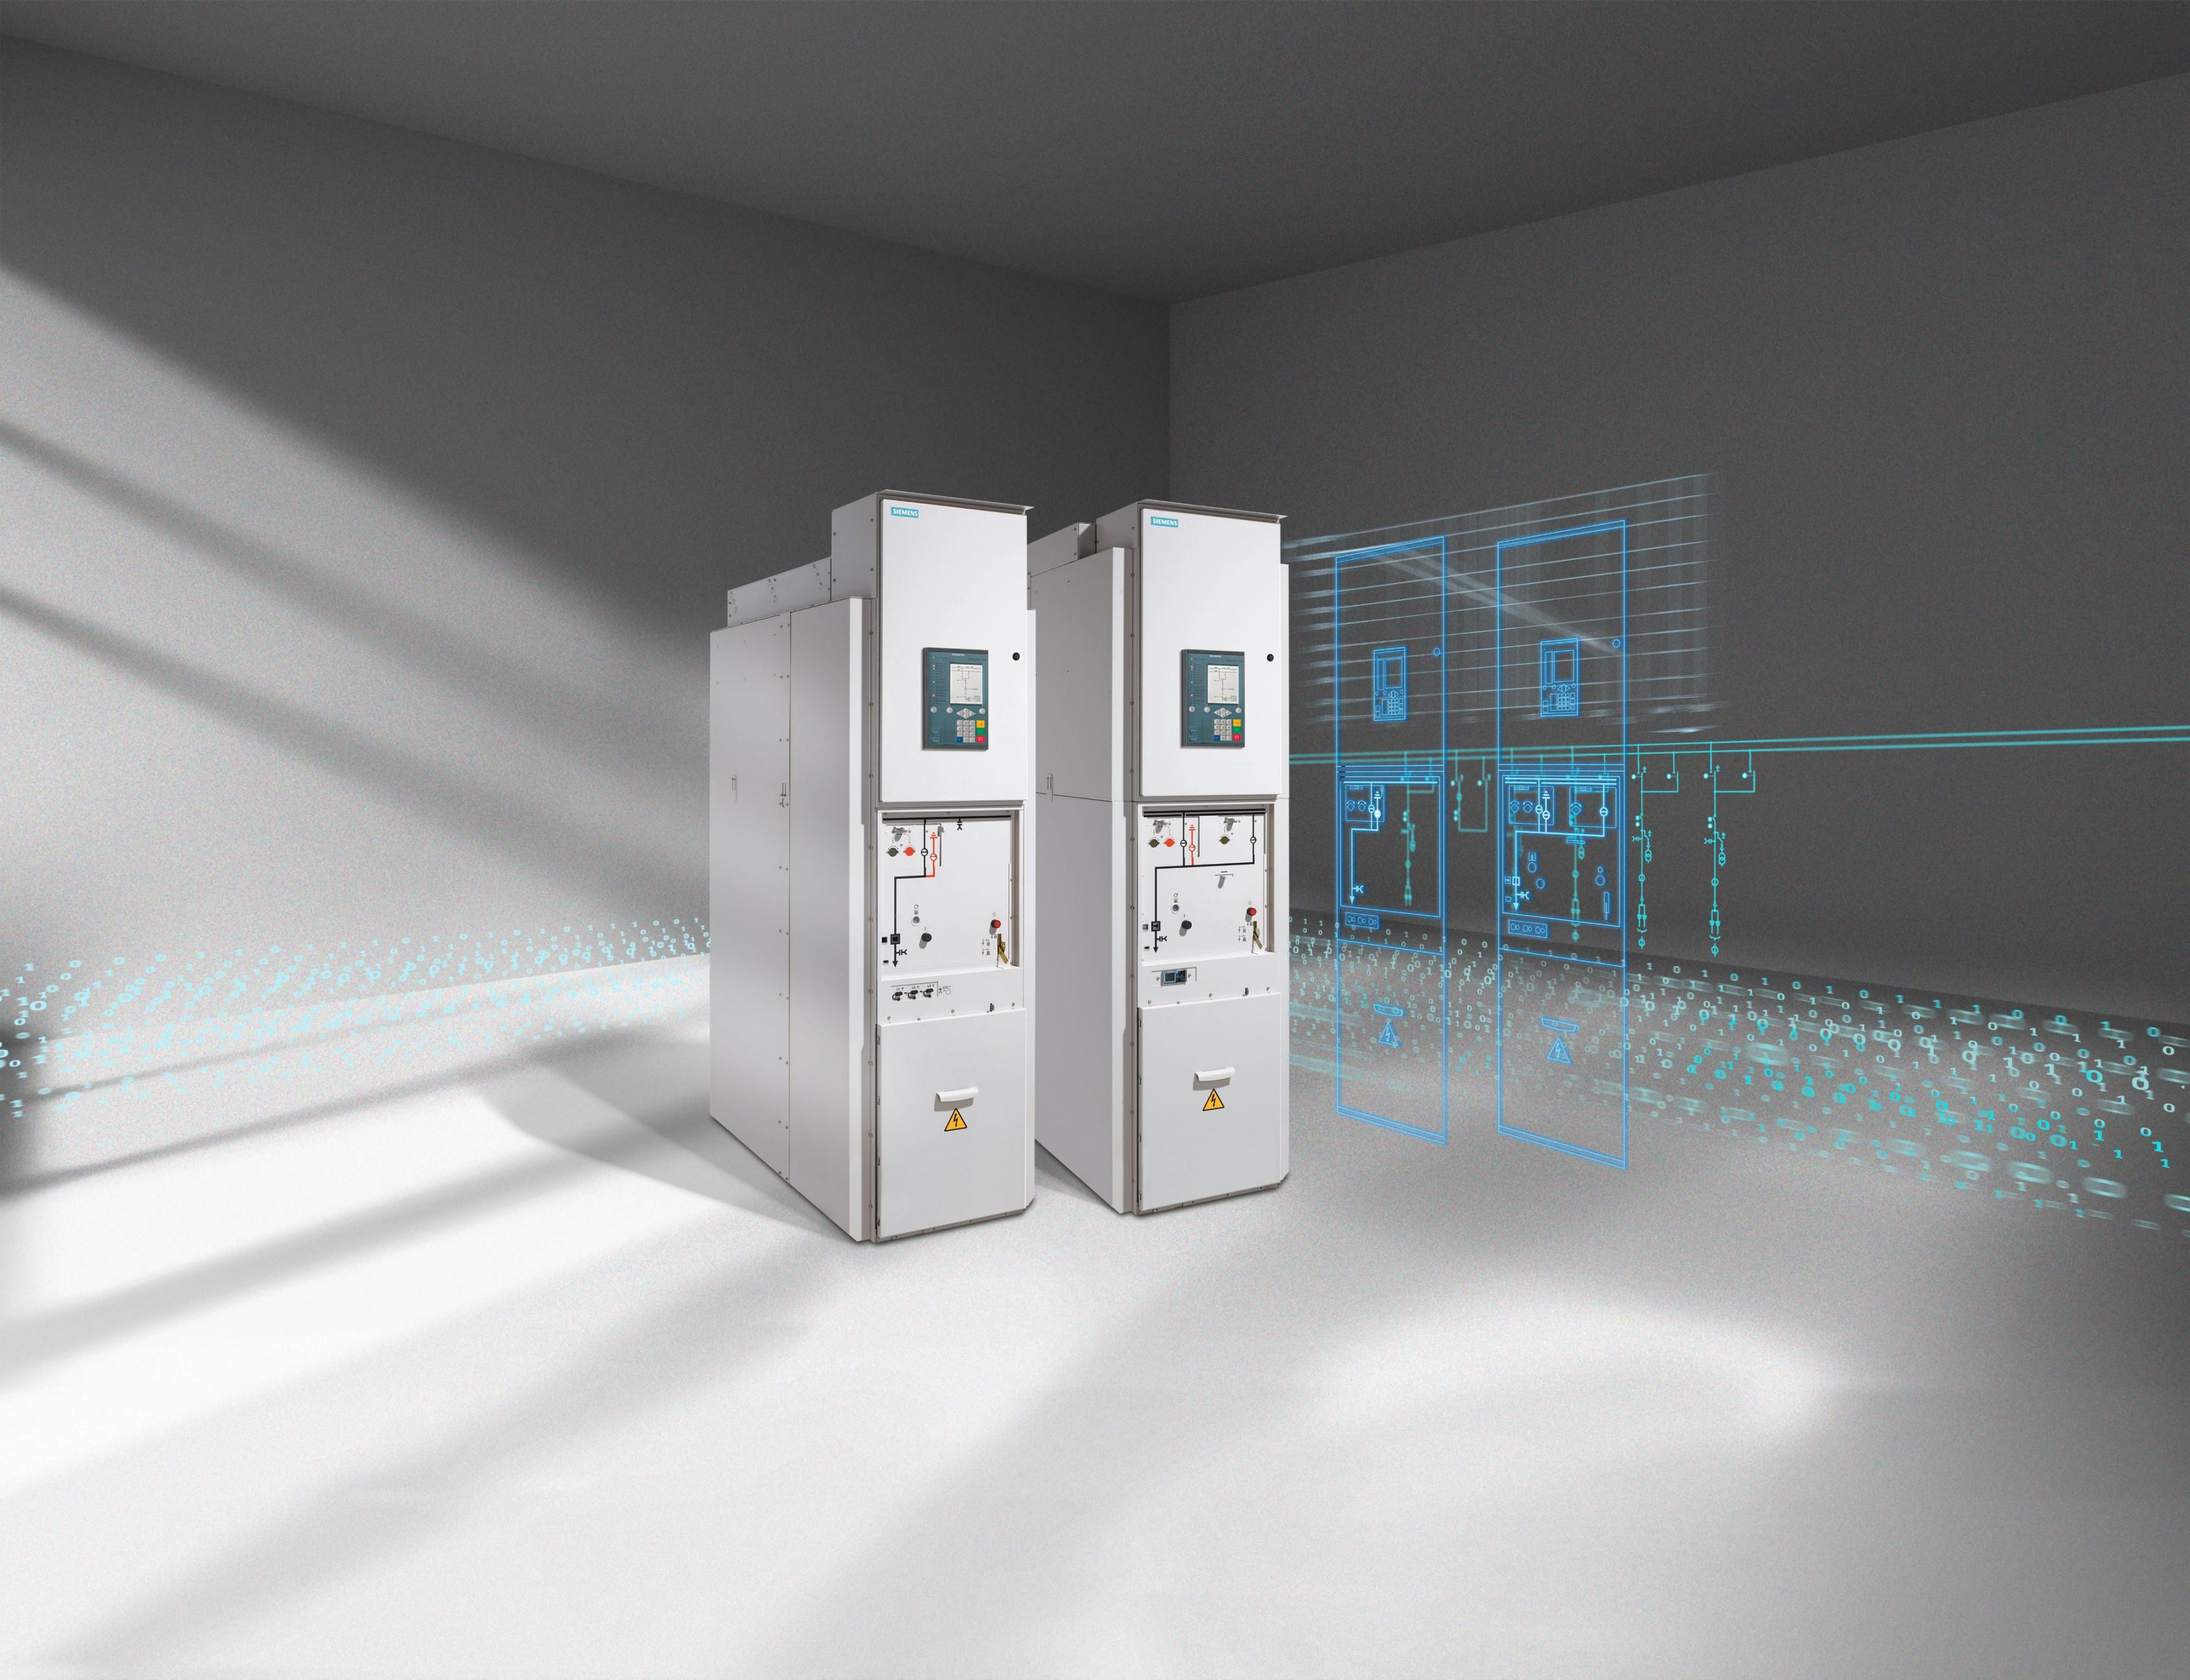 NXPLUS | Systems | Siemens